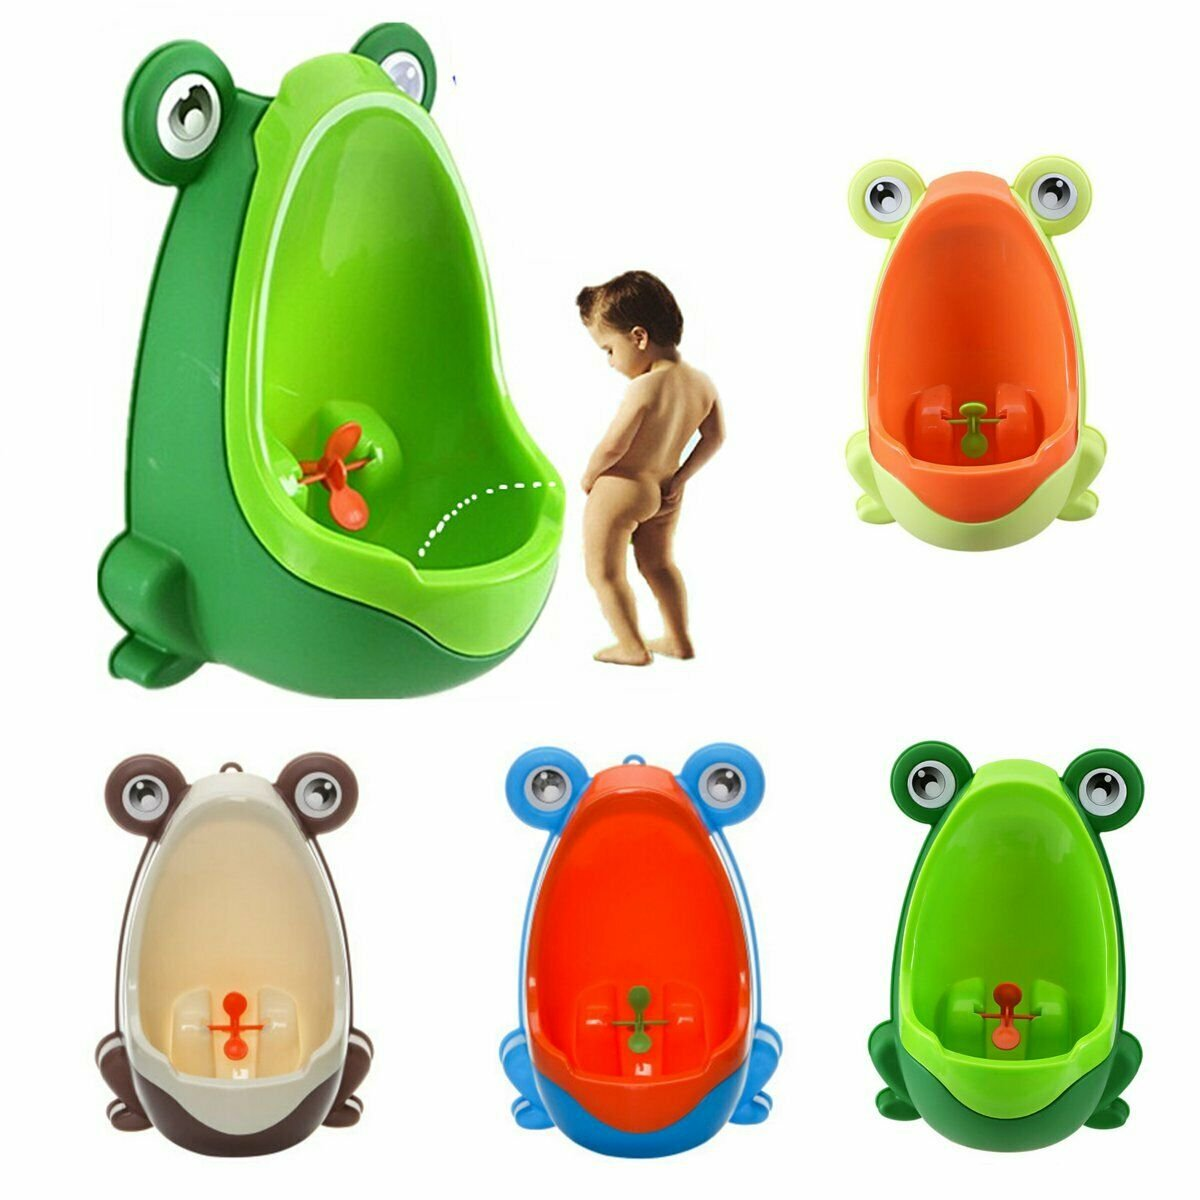 bestforyou11 Fashion Frog Boy Baby Toilet Training Children Kids Potty Urinal Pee Trainer